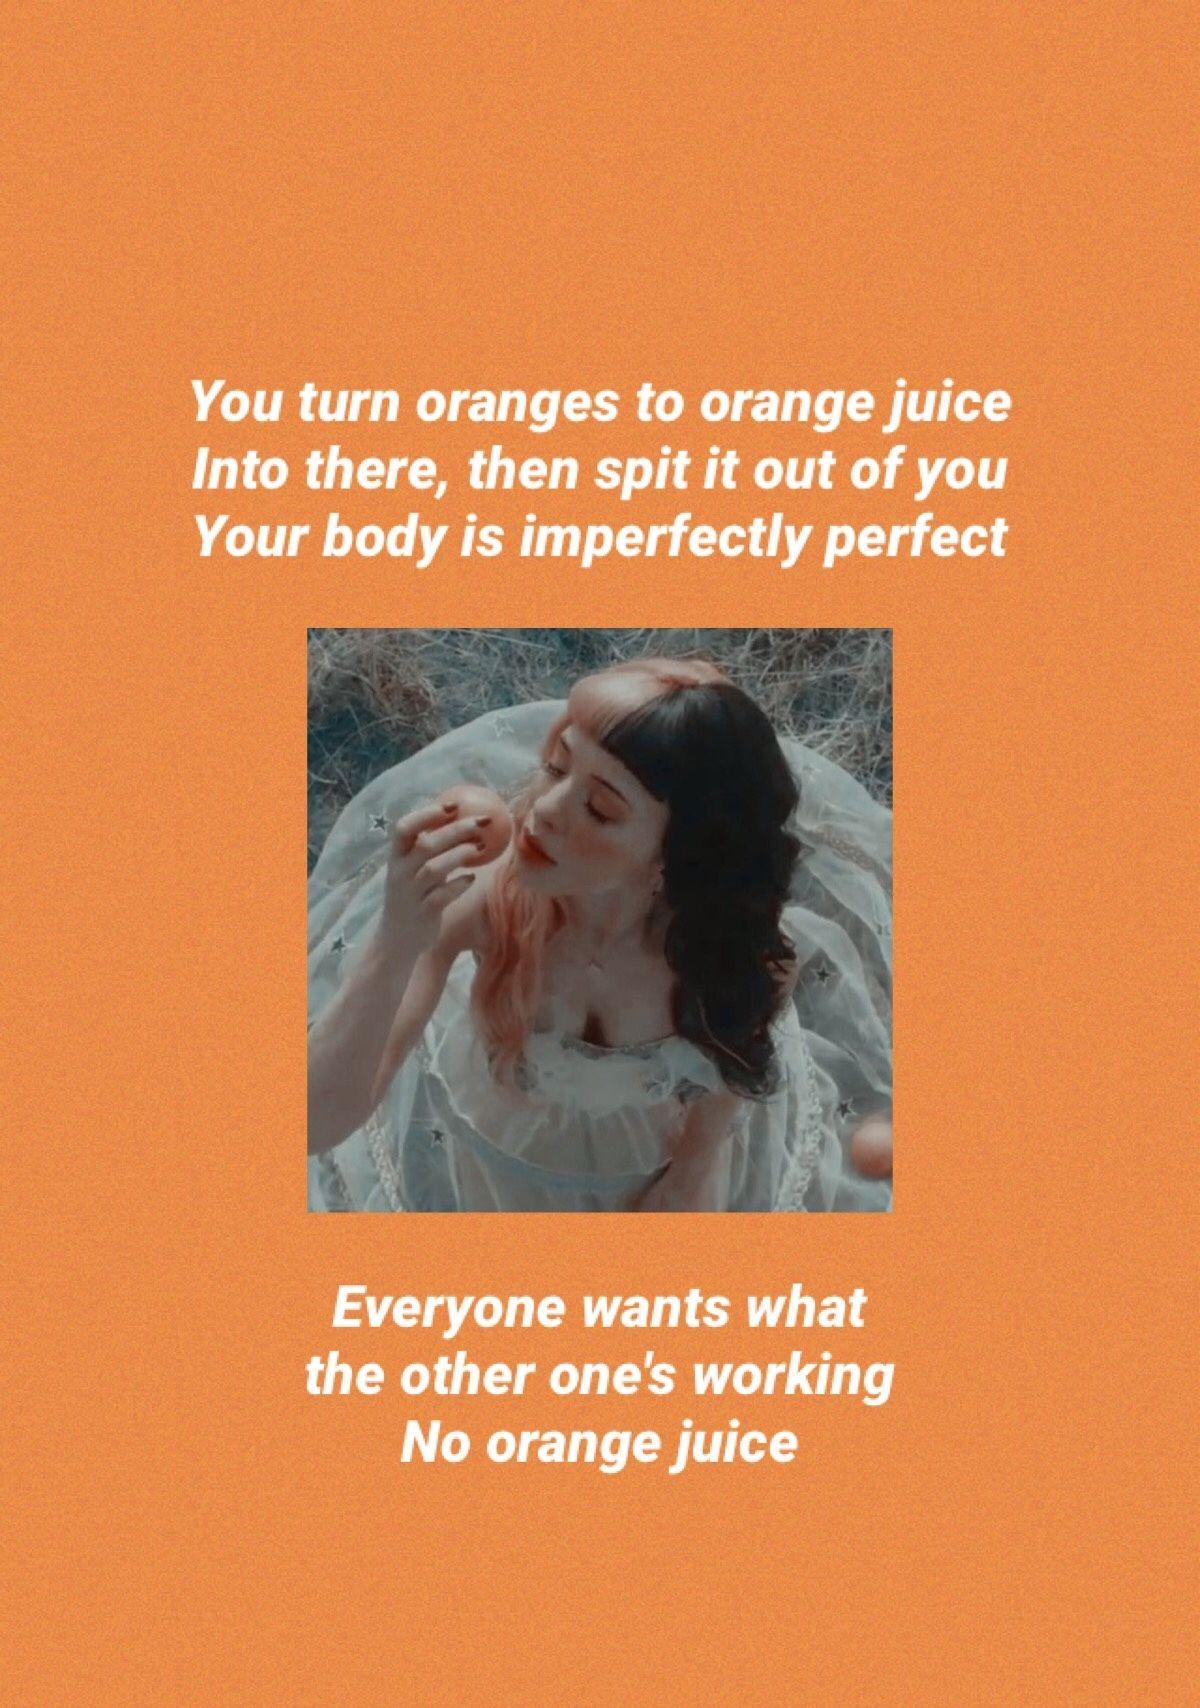 Orange Juice Melanie Martinez K 12 Lyrics Melanie Martinez Songs Melanie Martinez Melanie Martinez Quotes